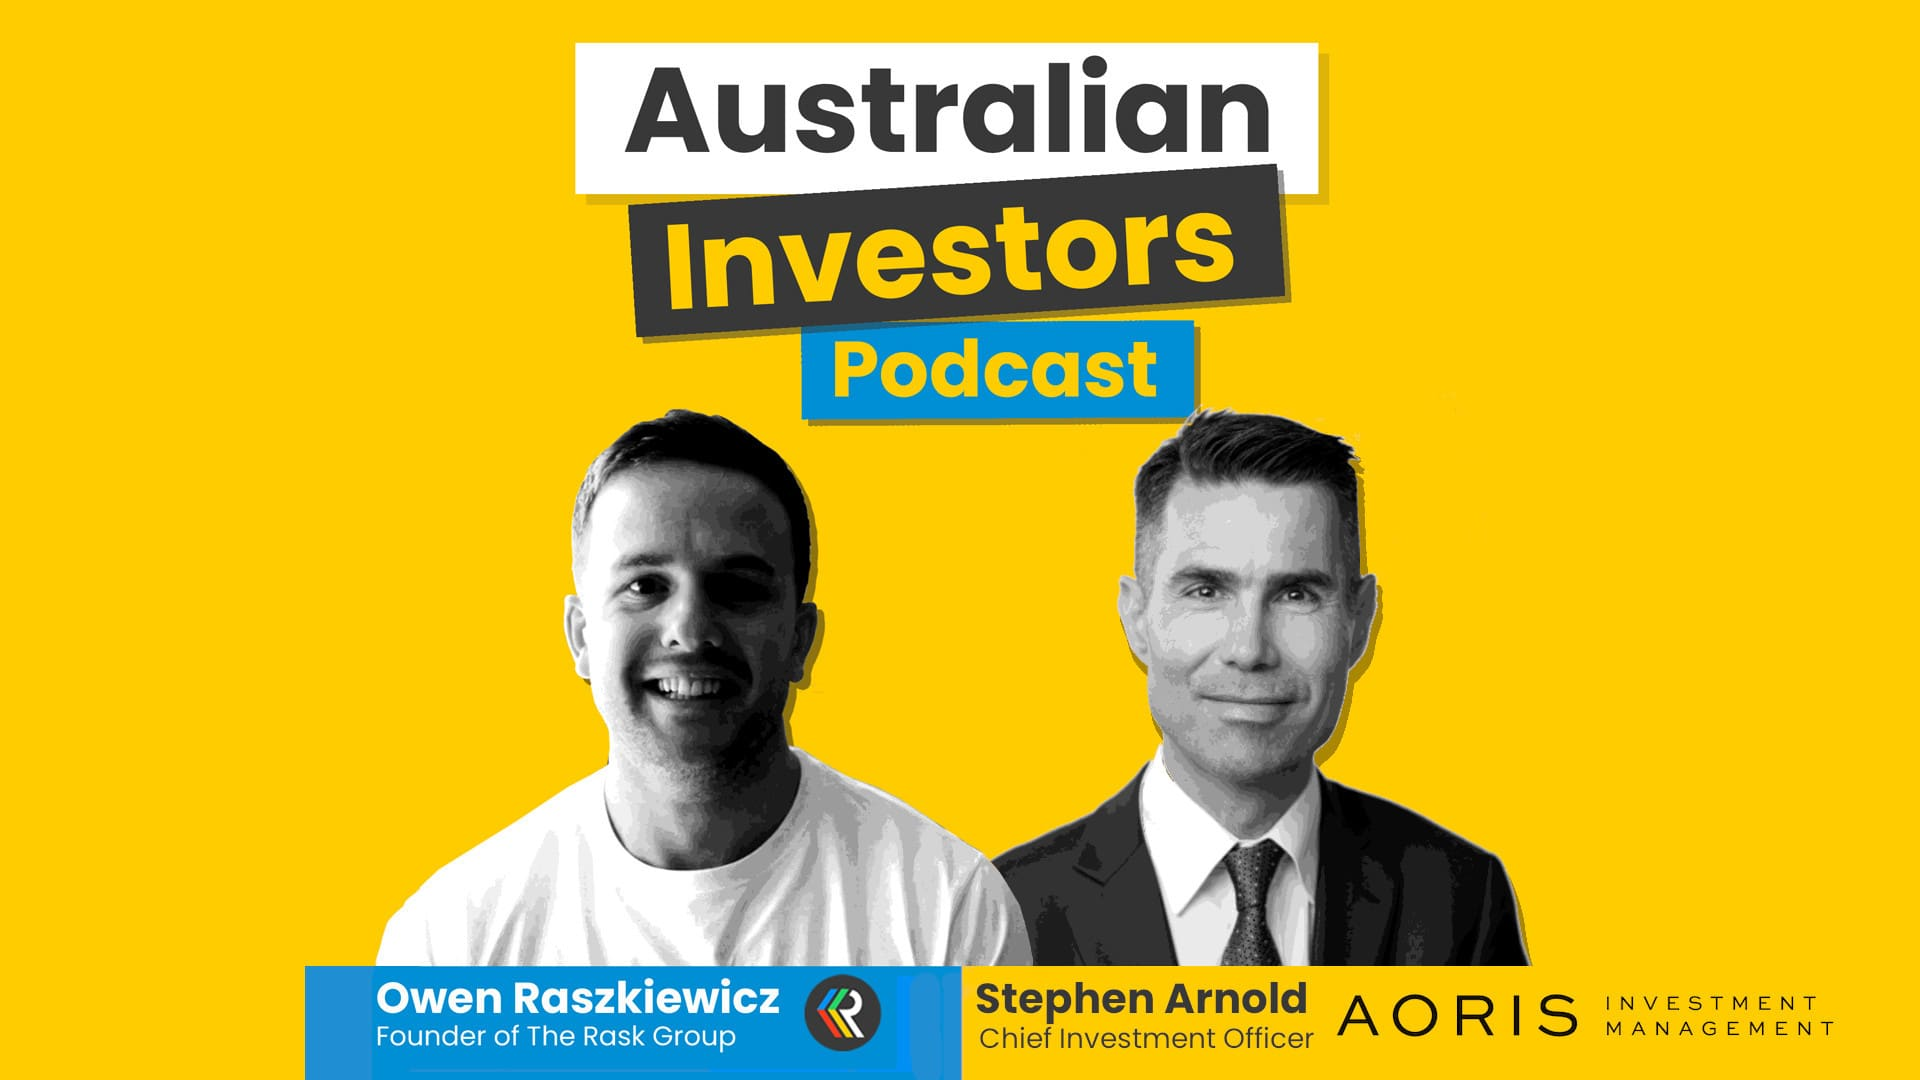 Stephen Arnold Australian Investors Podcast